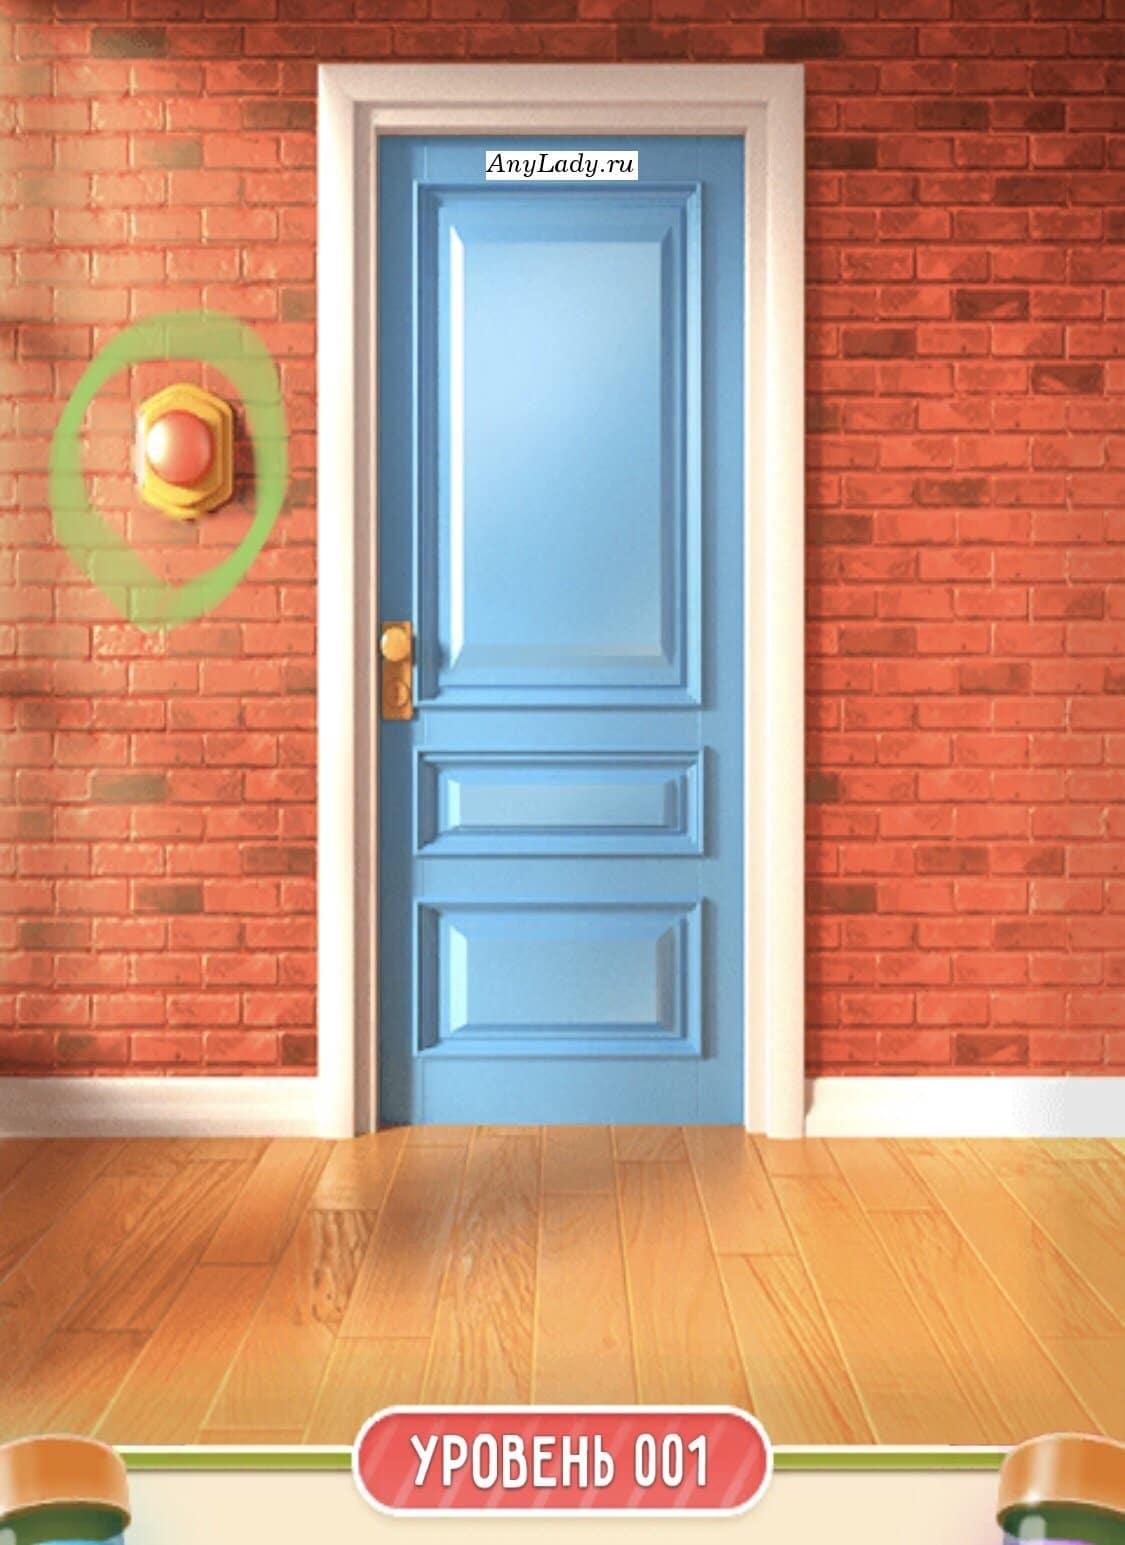 Нажмите на кнопку слева от двери, чтобы открыть её. За тем нажмите на коридор и переходите в следующую комнату.